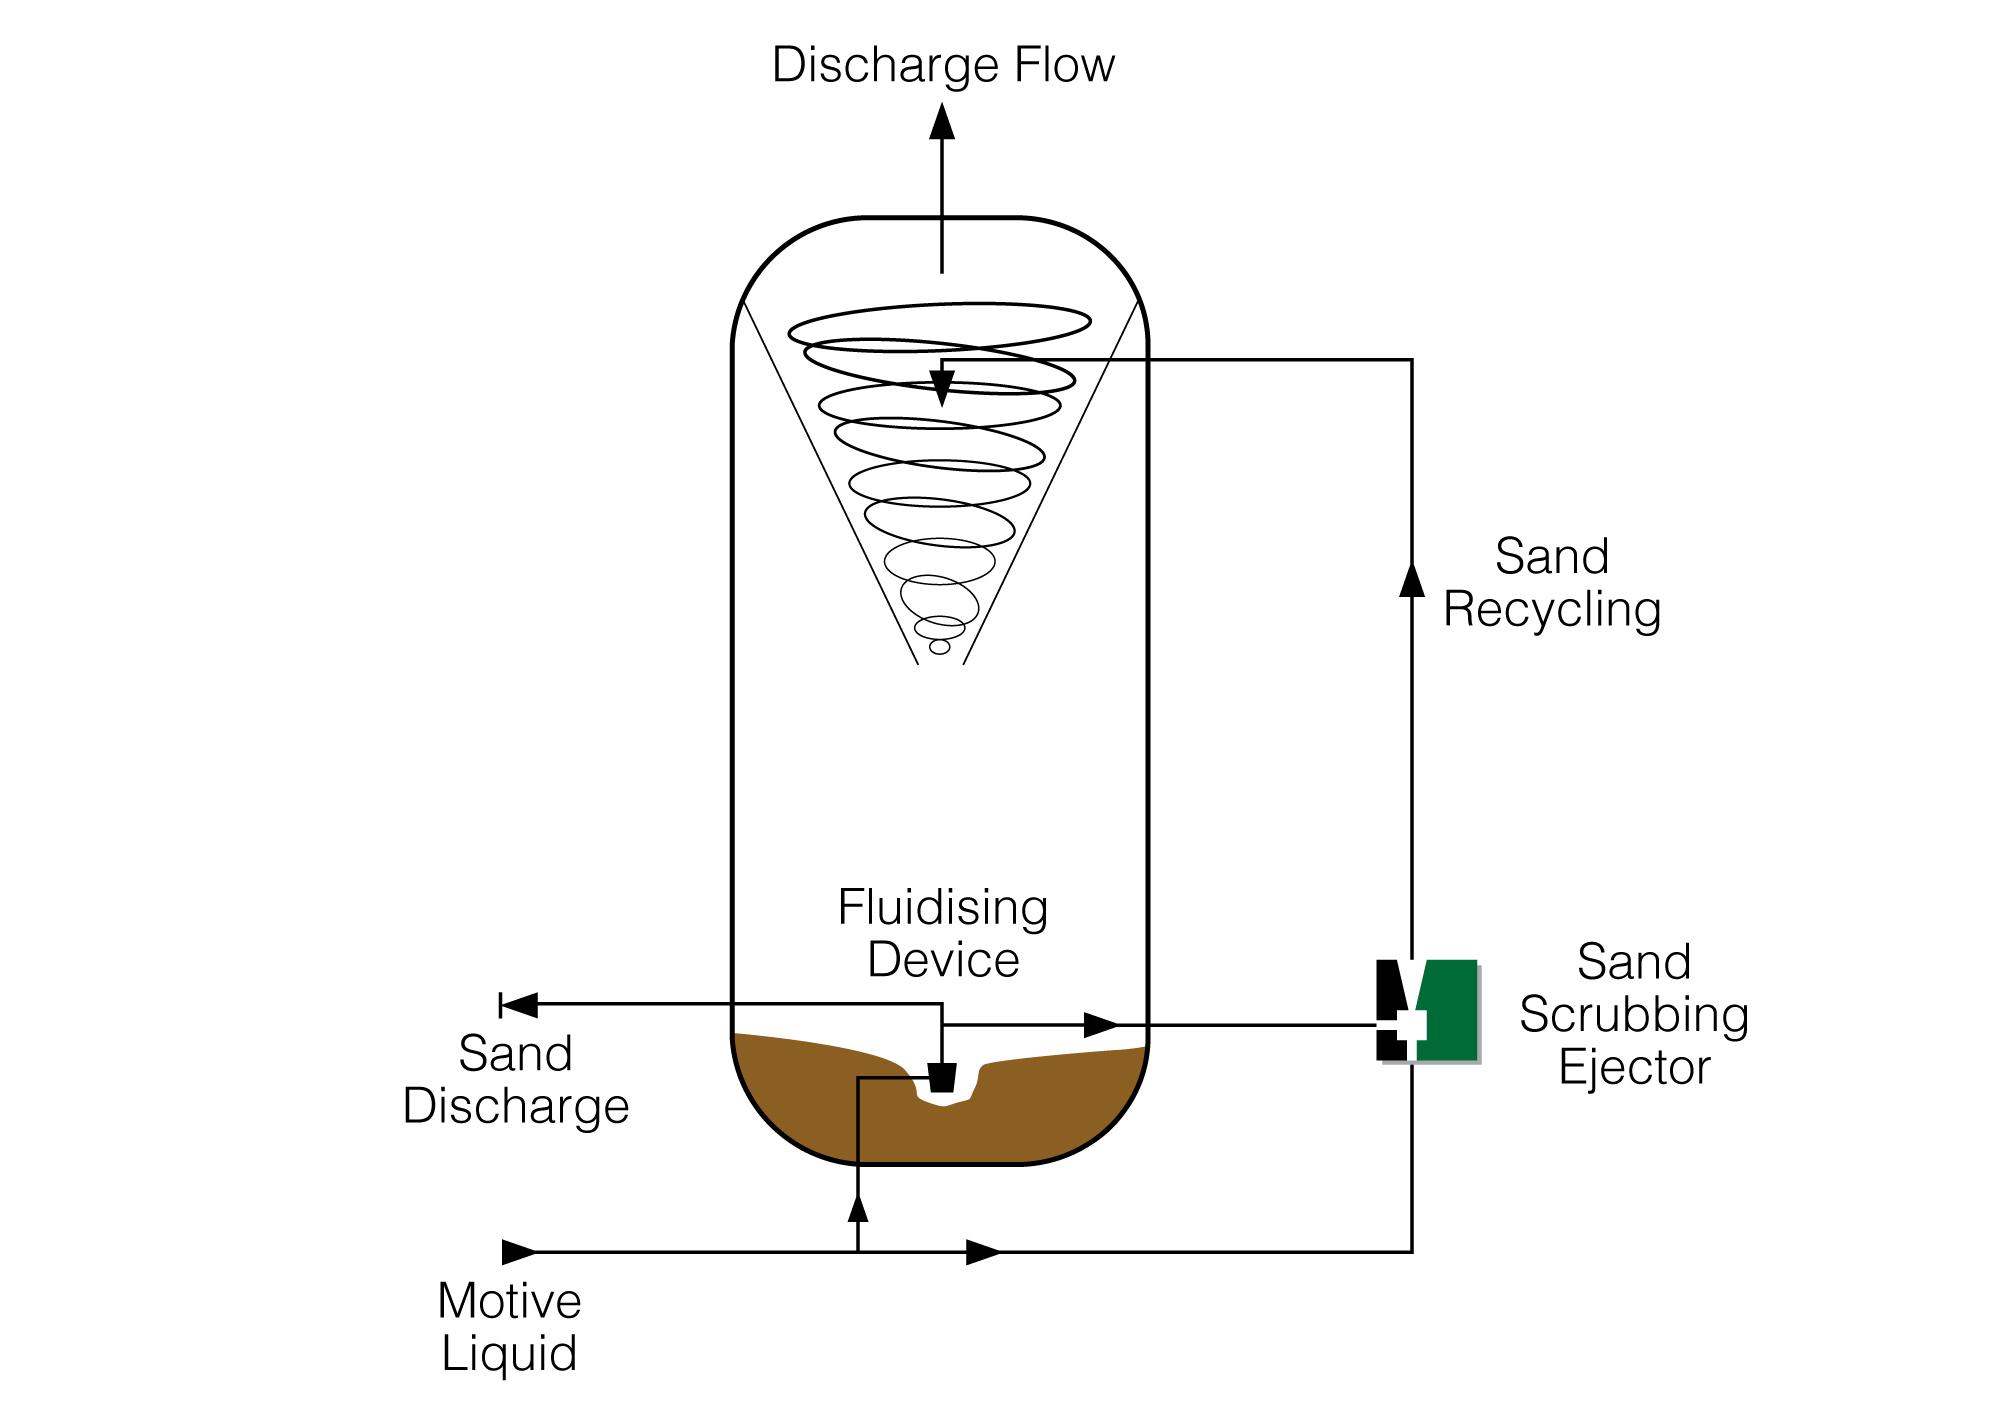 Sand scrubbing Ejector